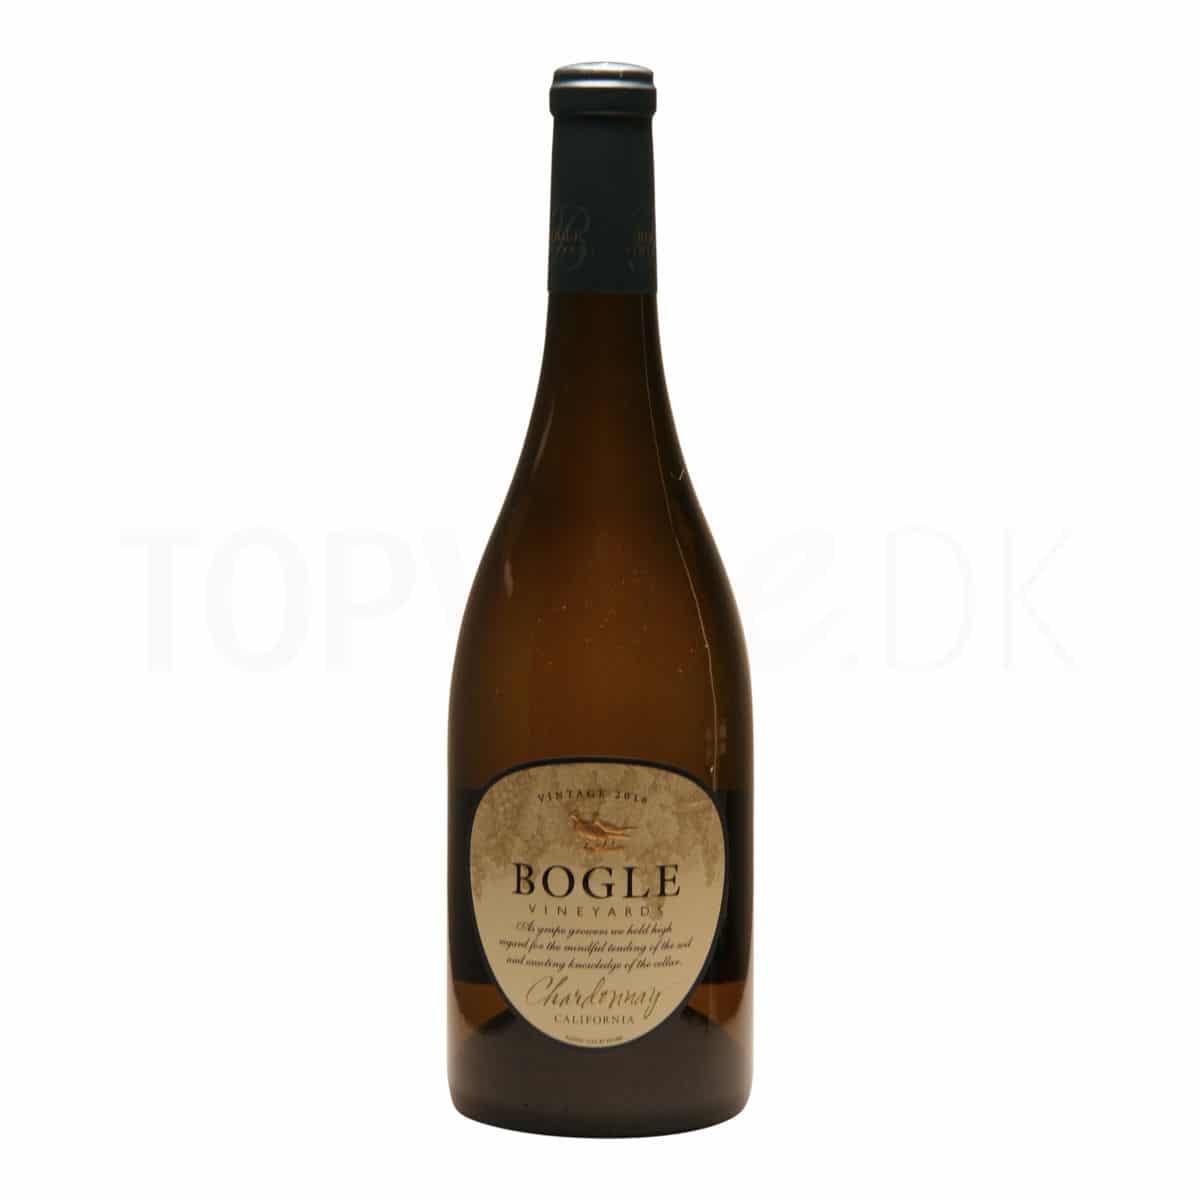 Topvine Bogle Chardonnay 2017